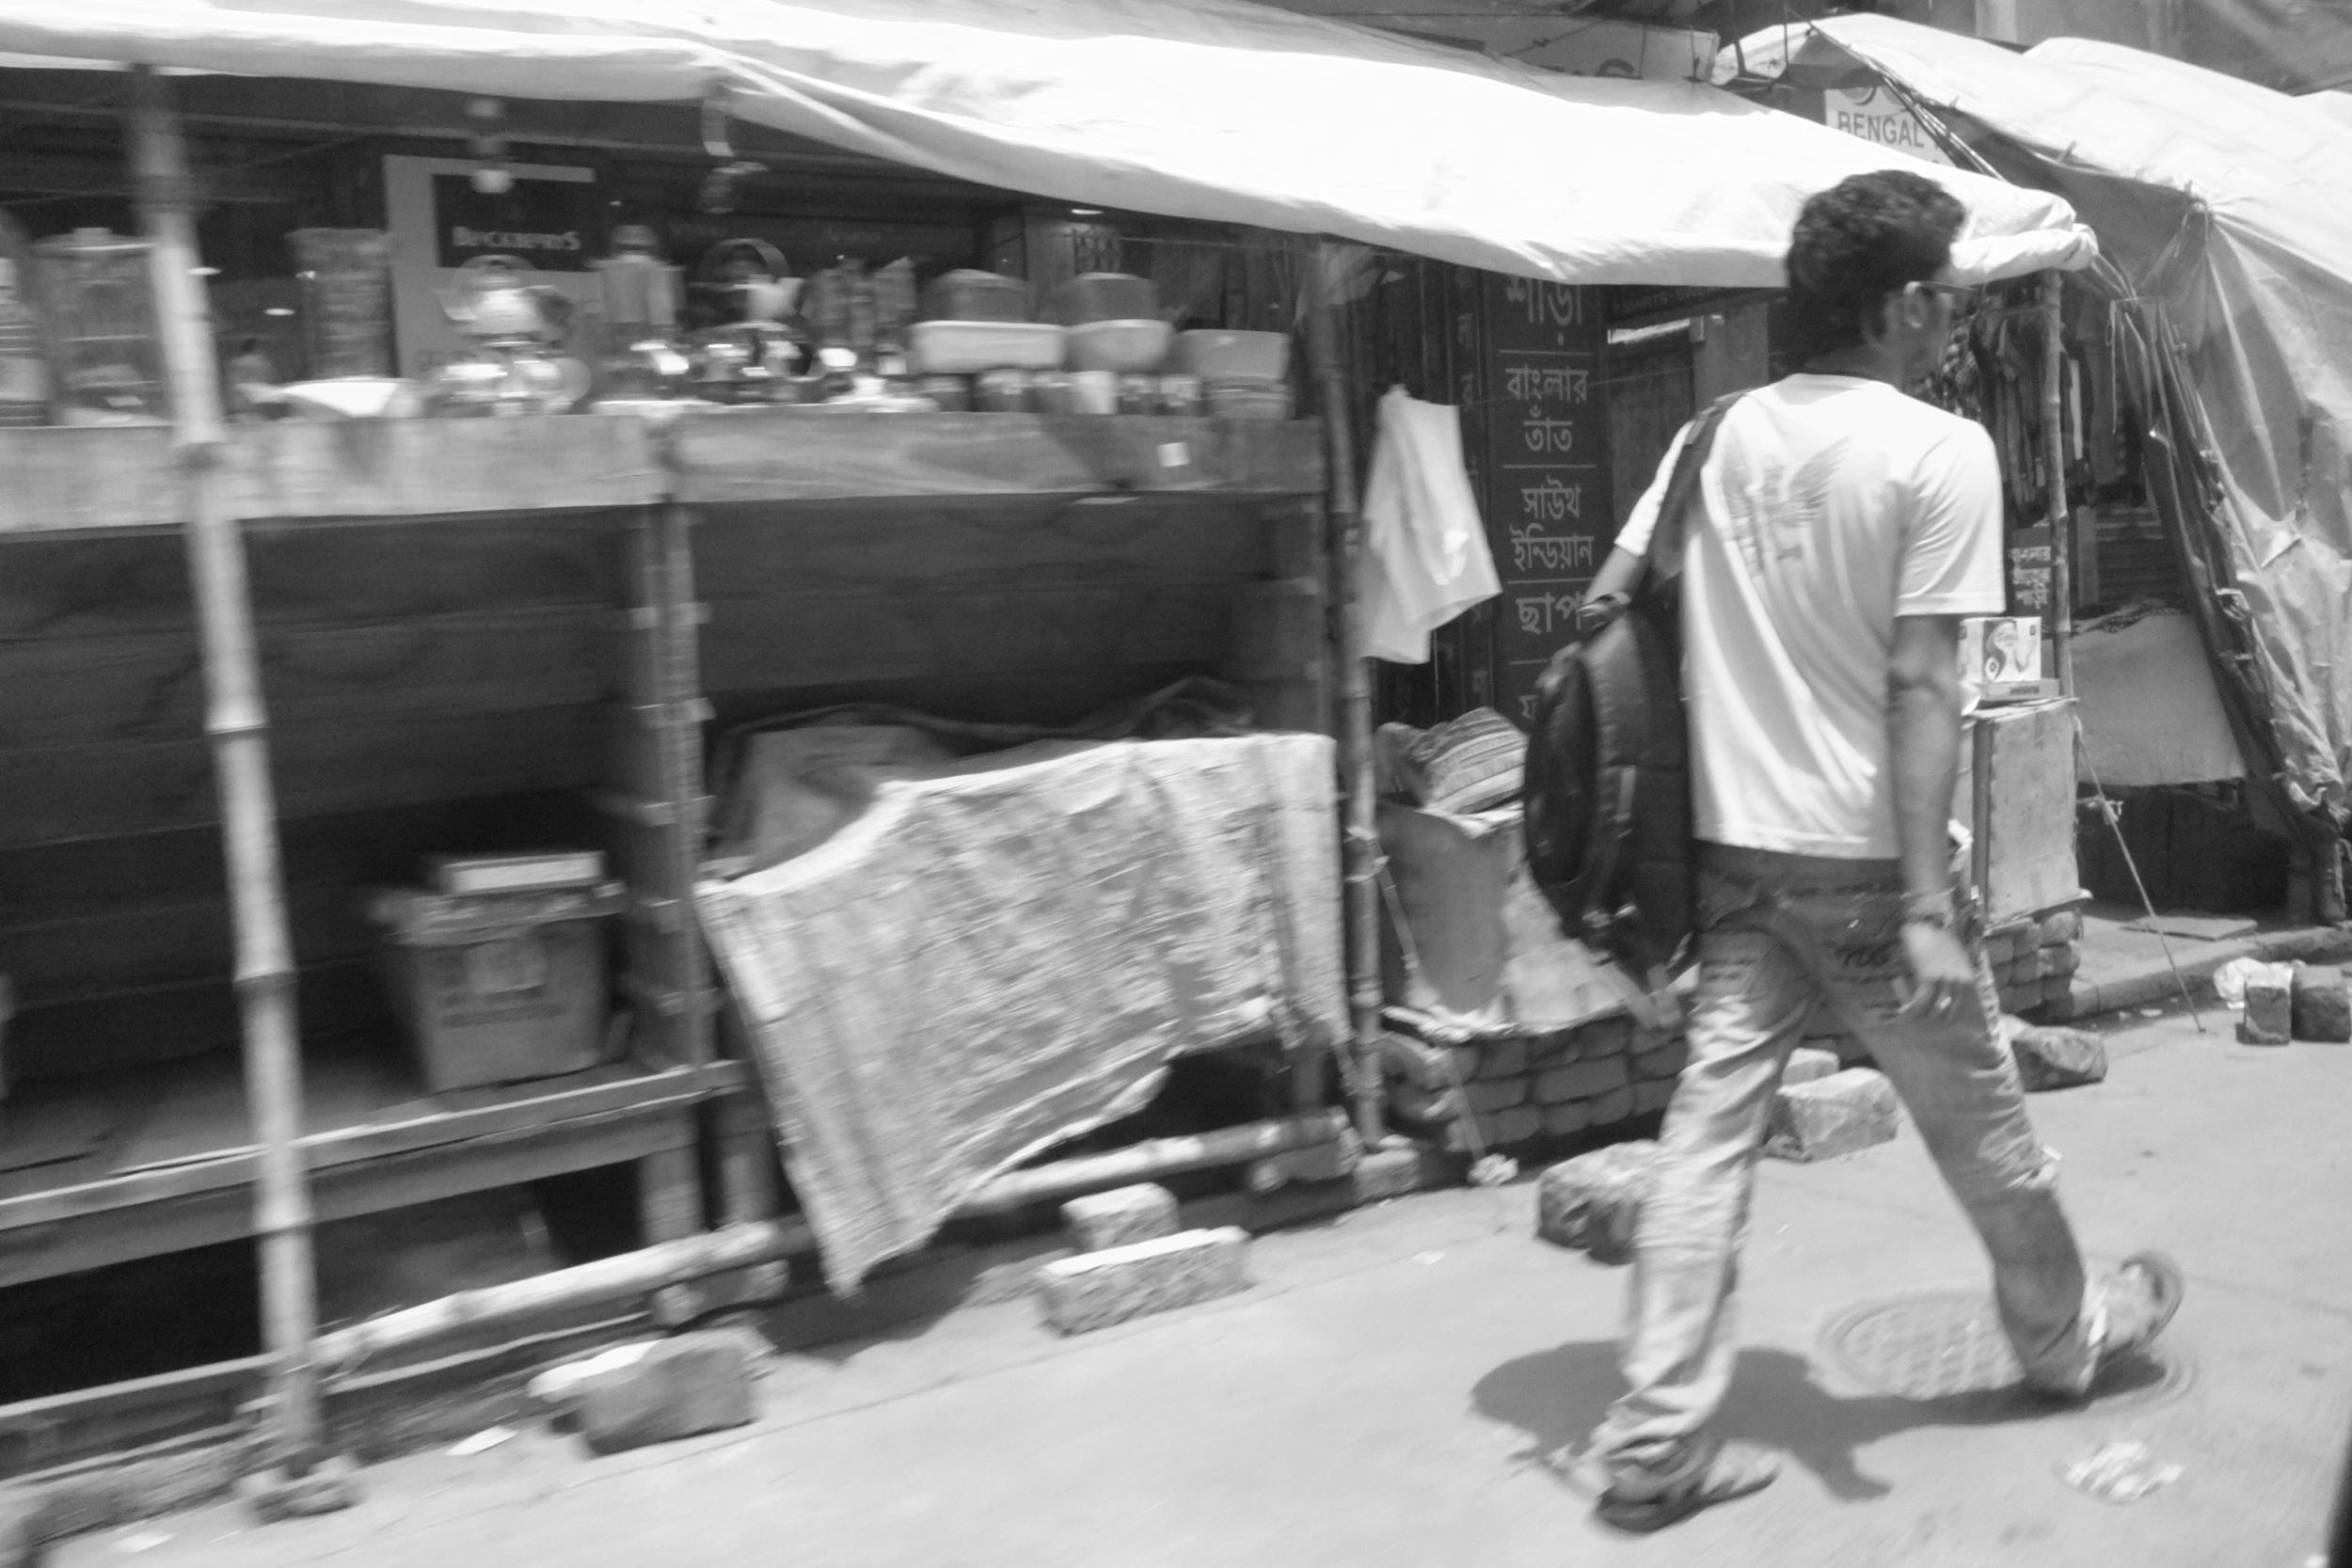 India-July2013 056.JPG